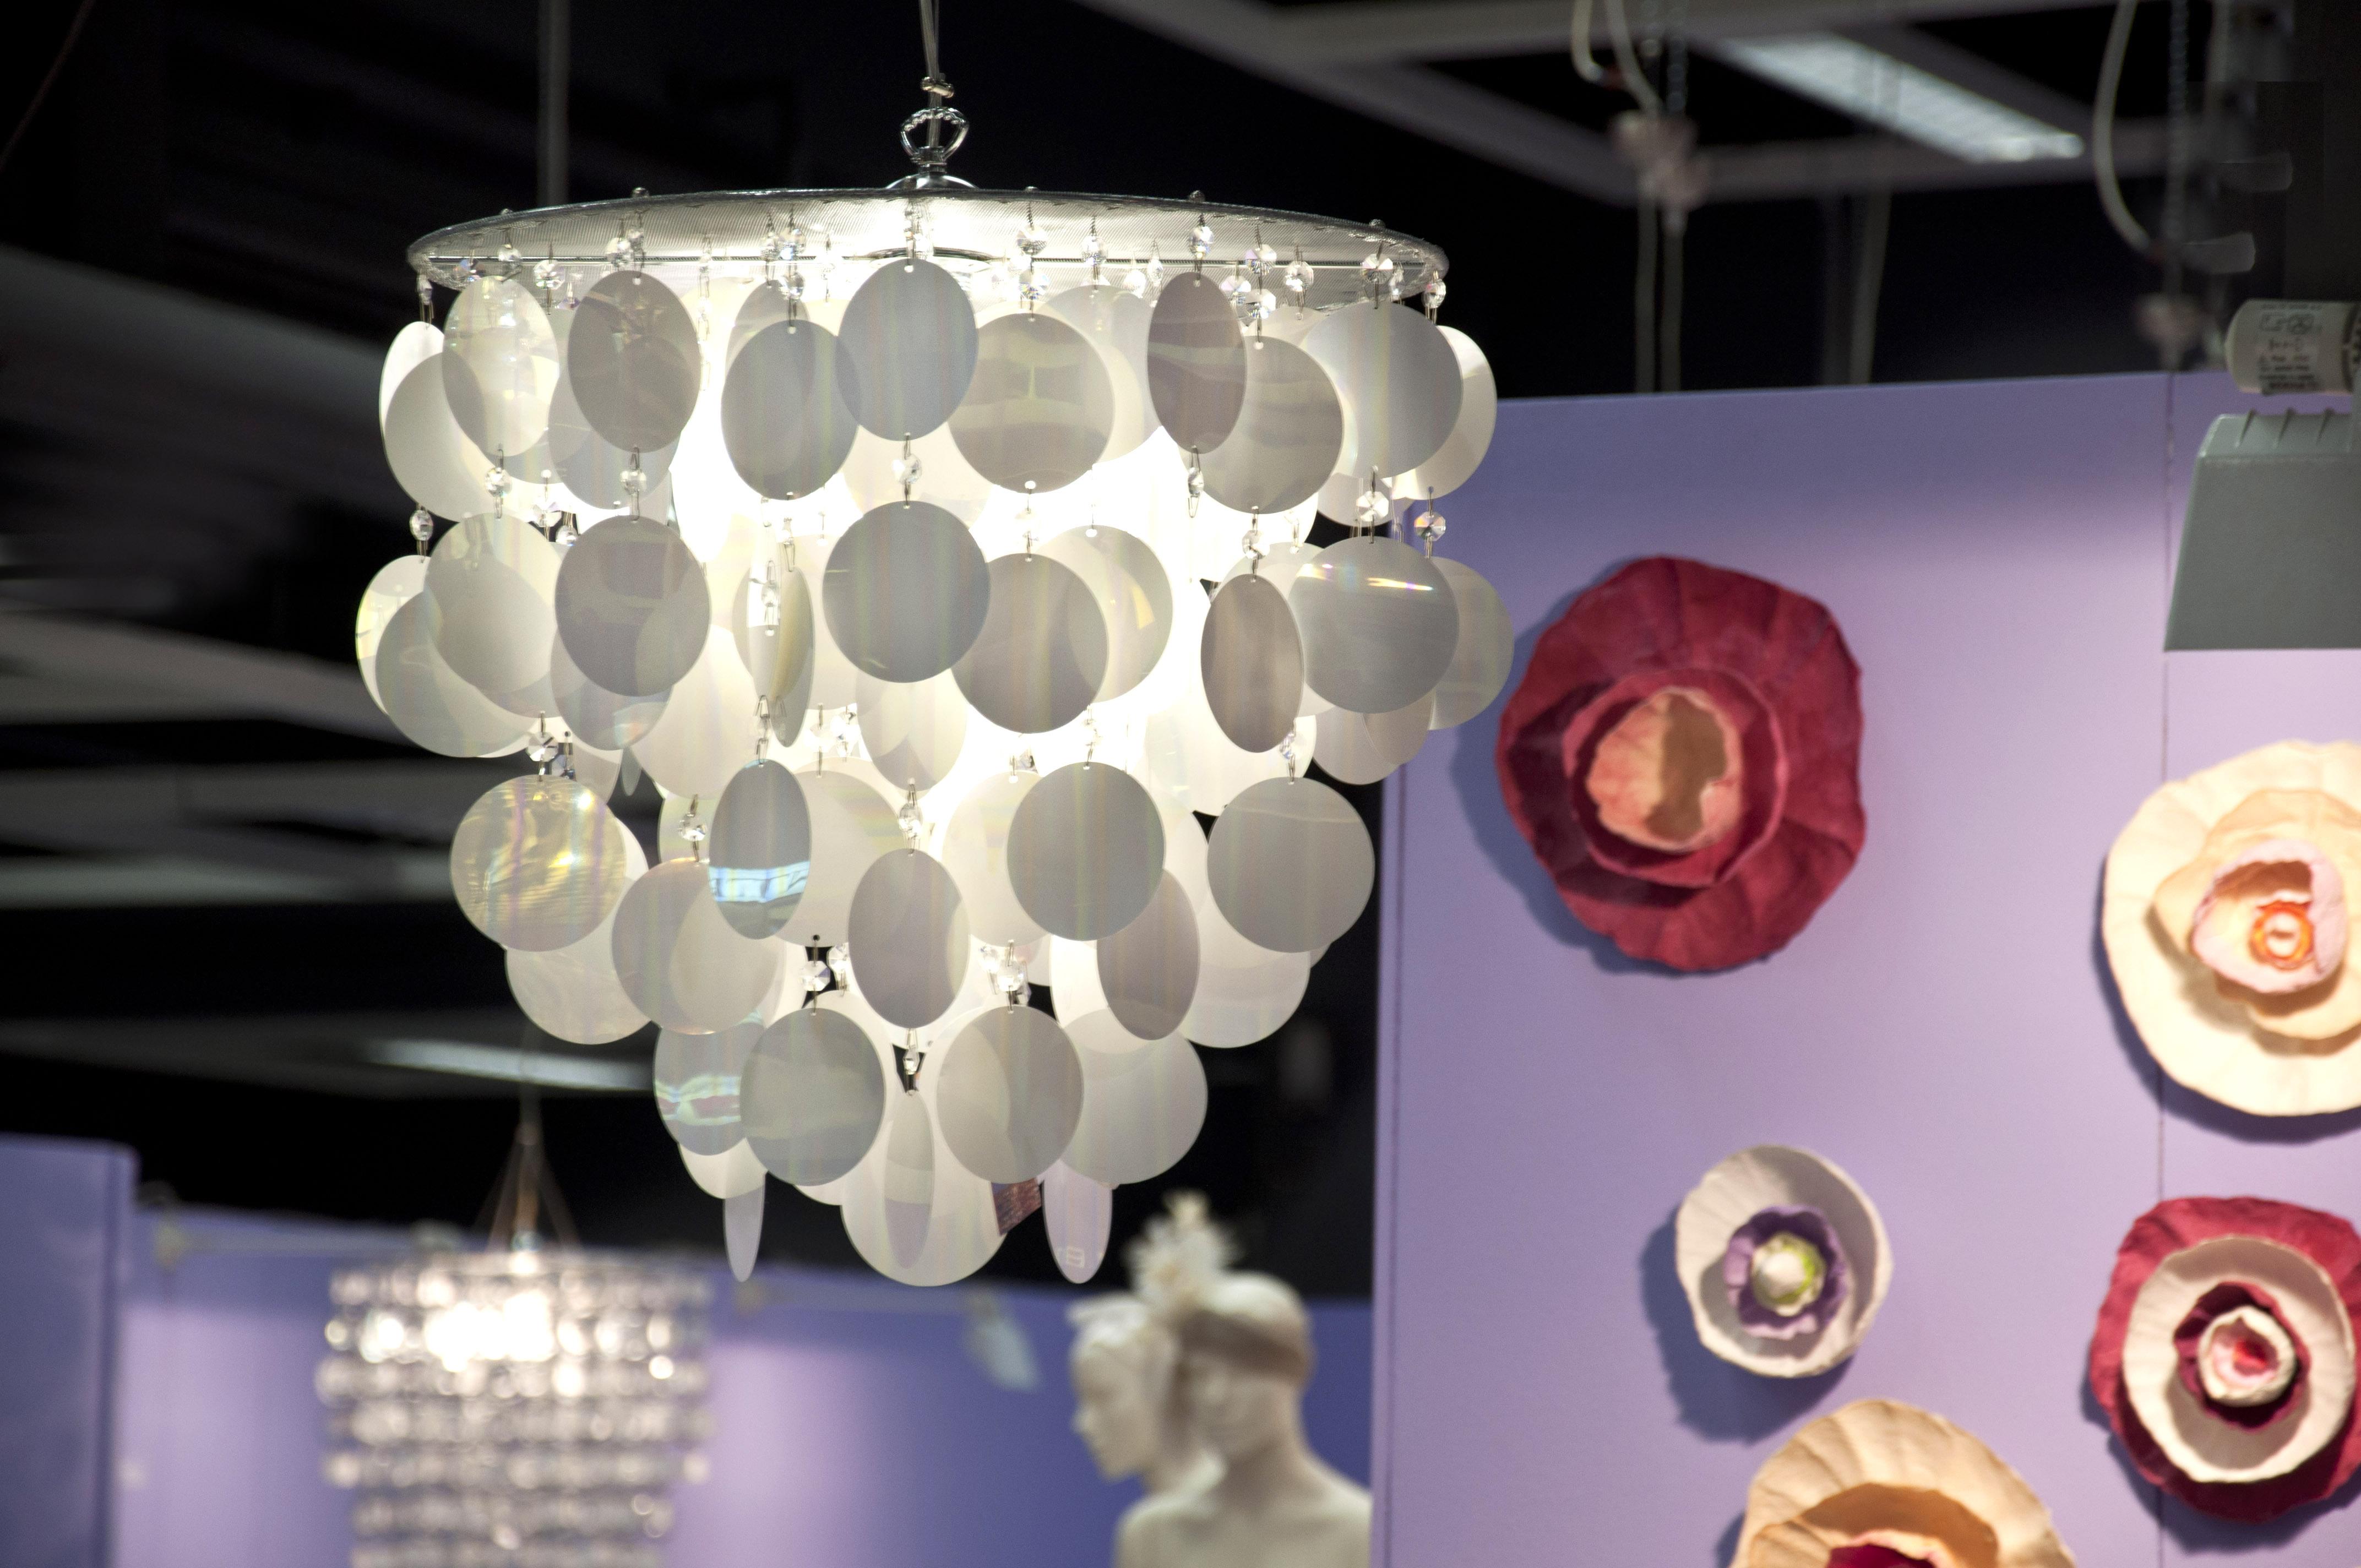 Esposizione di lampadari e sculture luminose di adriana lohmann ...